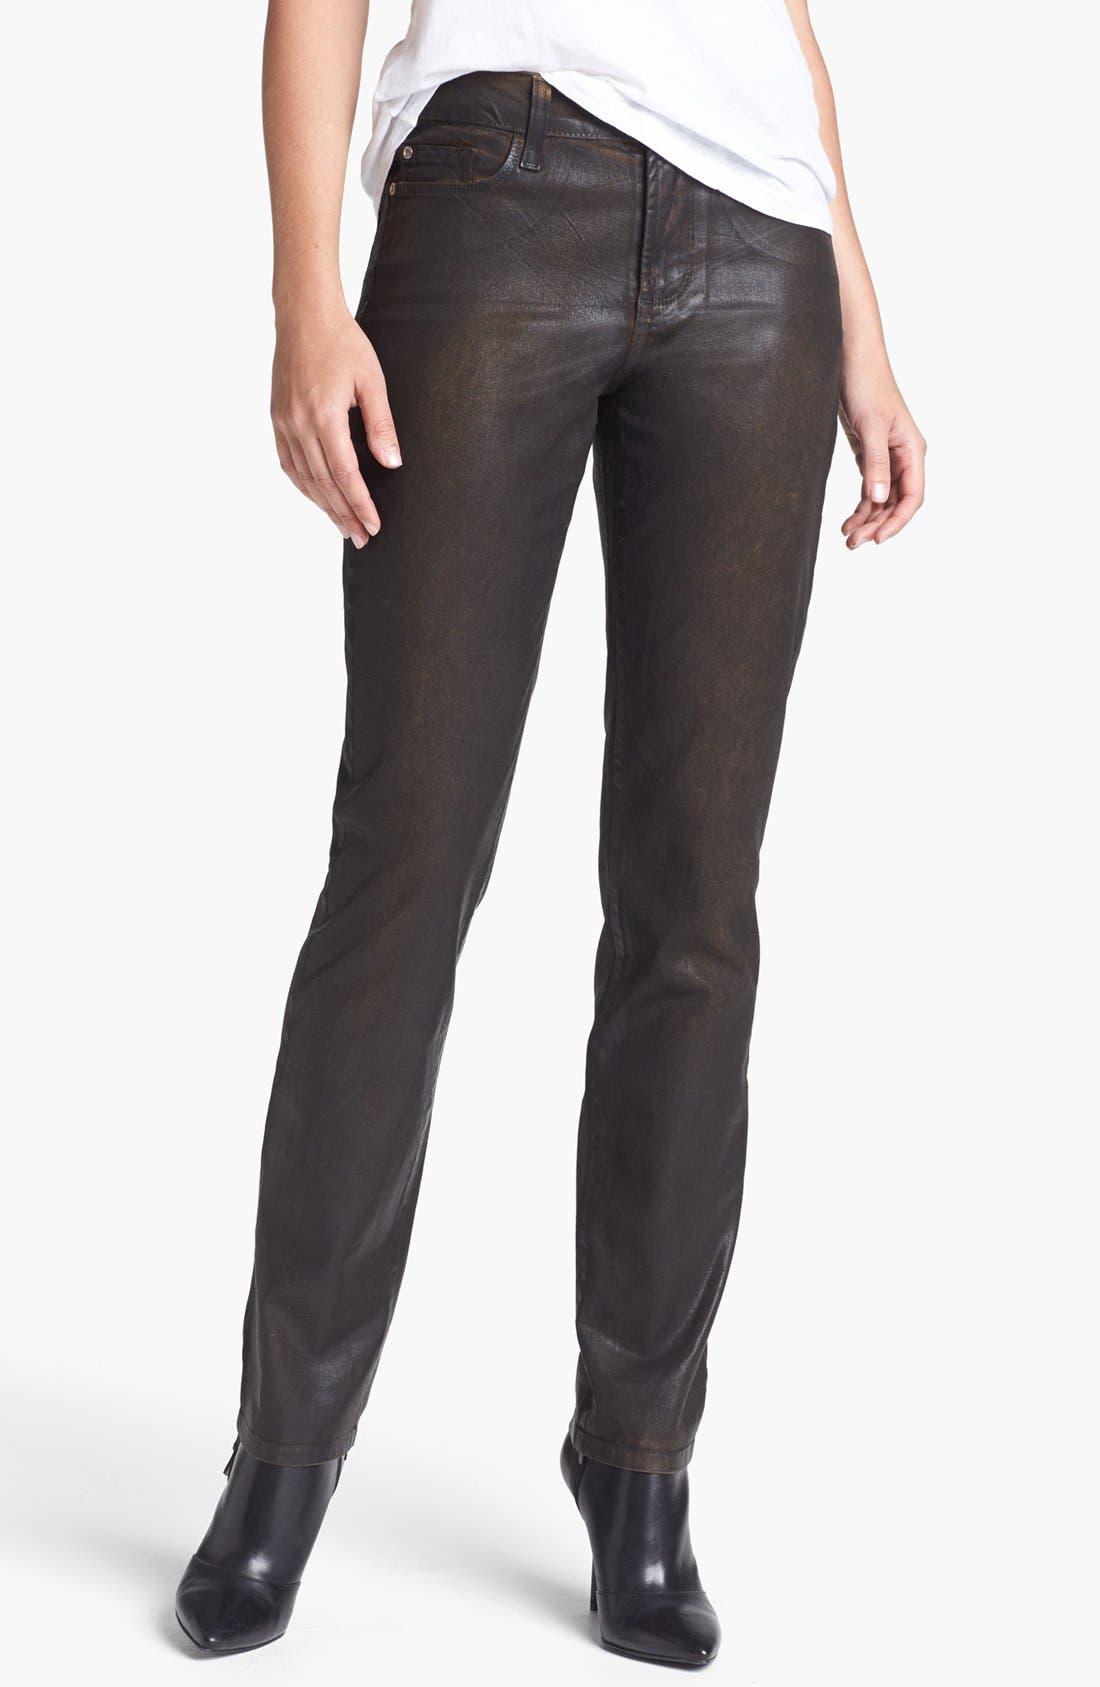 Main Image - NYDJ 'Sheri' Coated Stretch Skinny Jeans (Beat Leather)